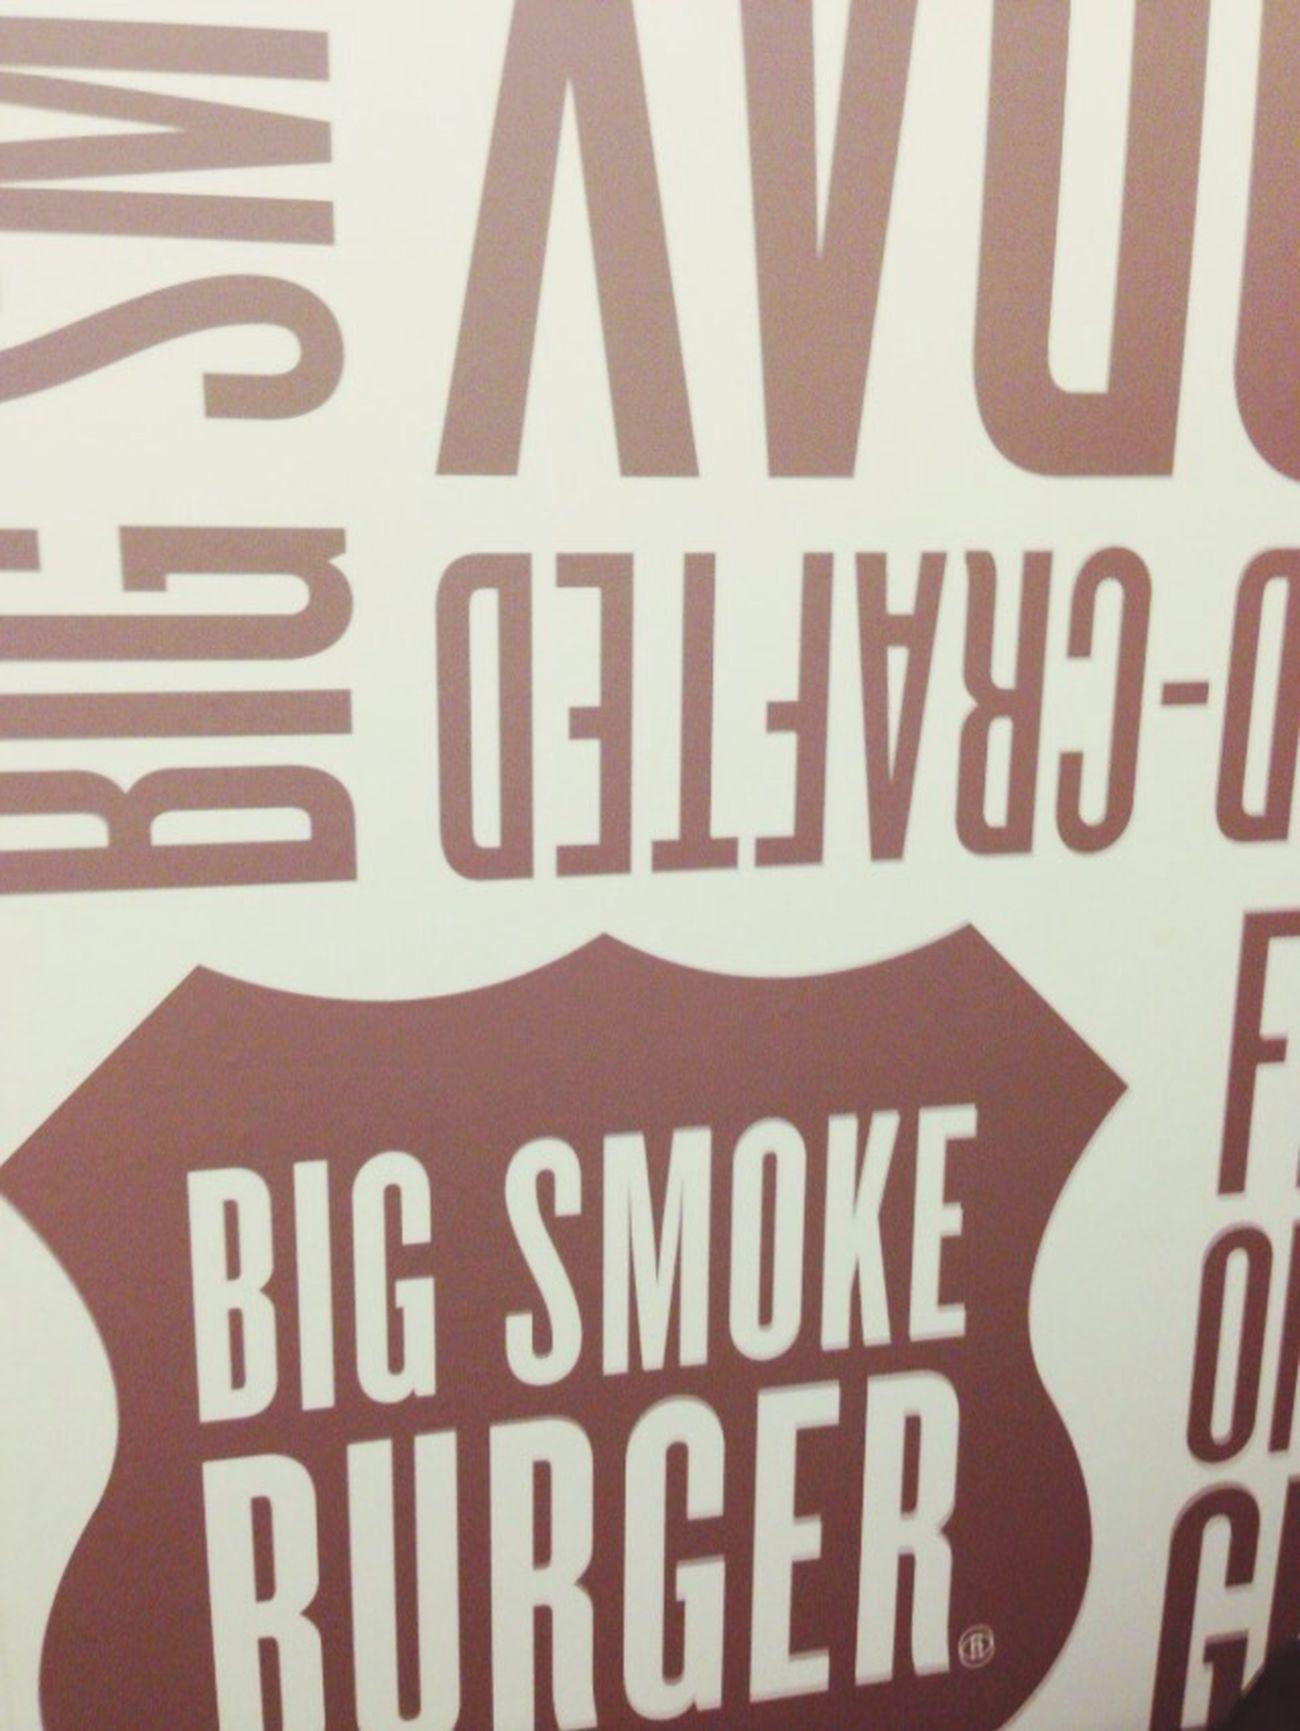 Big.smok ❤️❤️